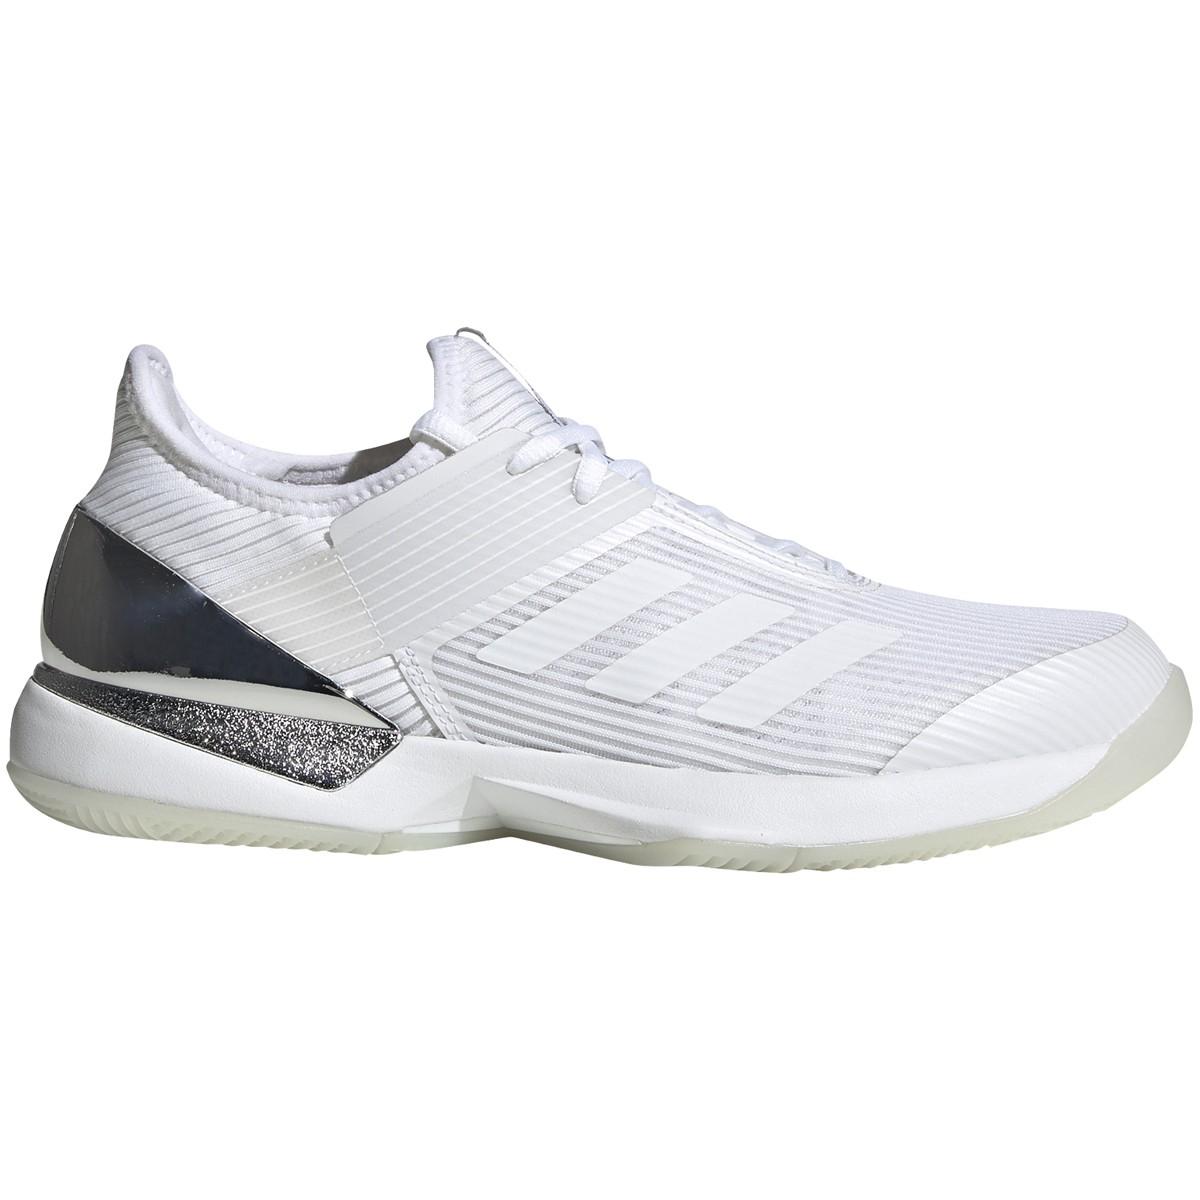 adidas scarpe adidas donna adizero ubersonic 3